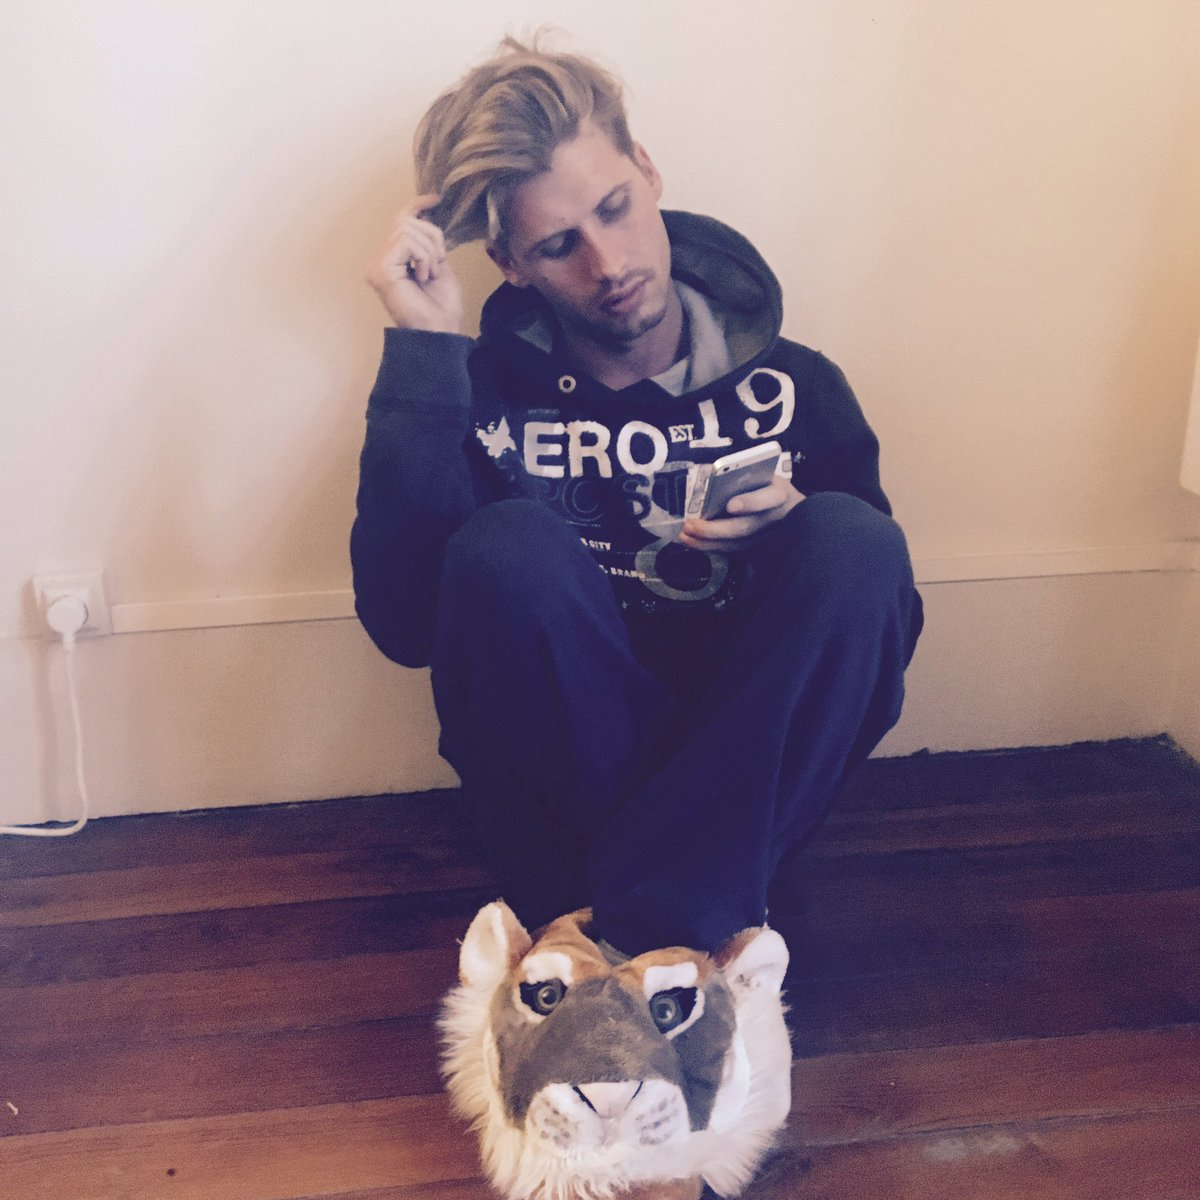 #Caroline #receveur #chilling #parquet #cornichon #tigerpic.twitter.com/PSN1rVM3x5